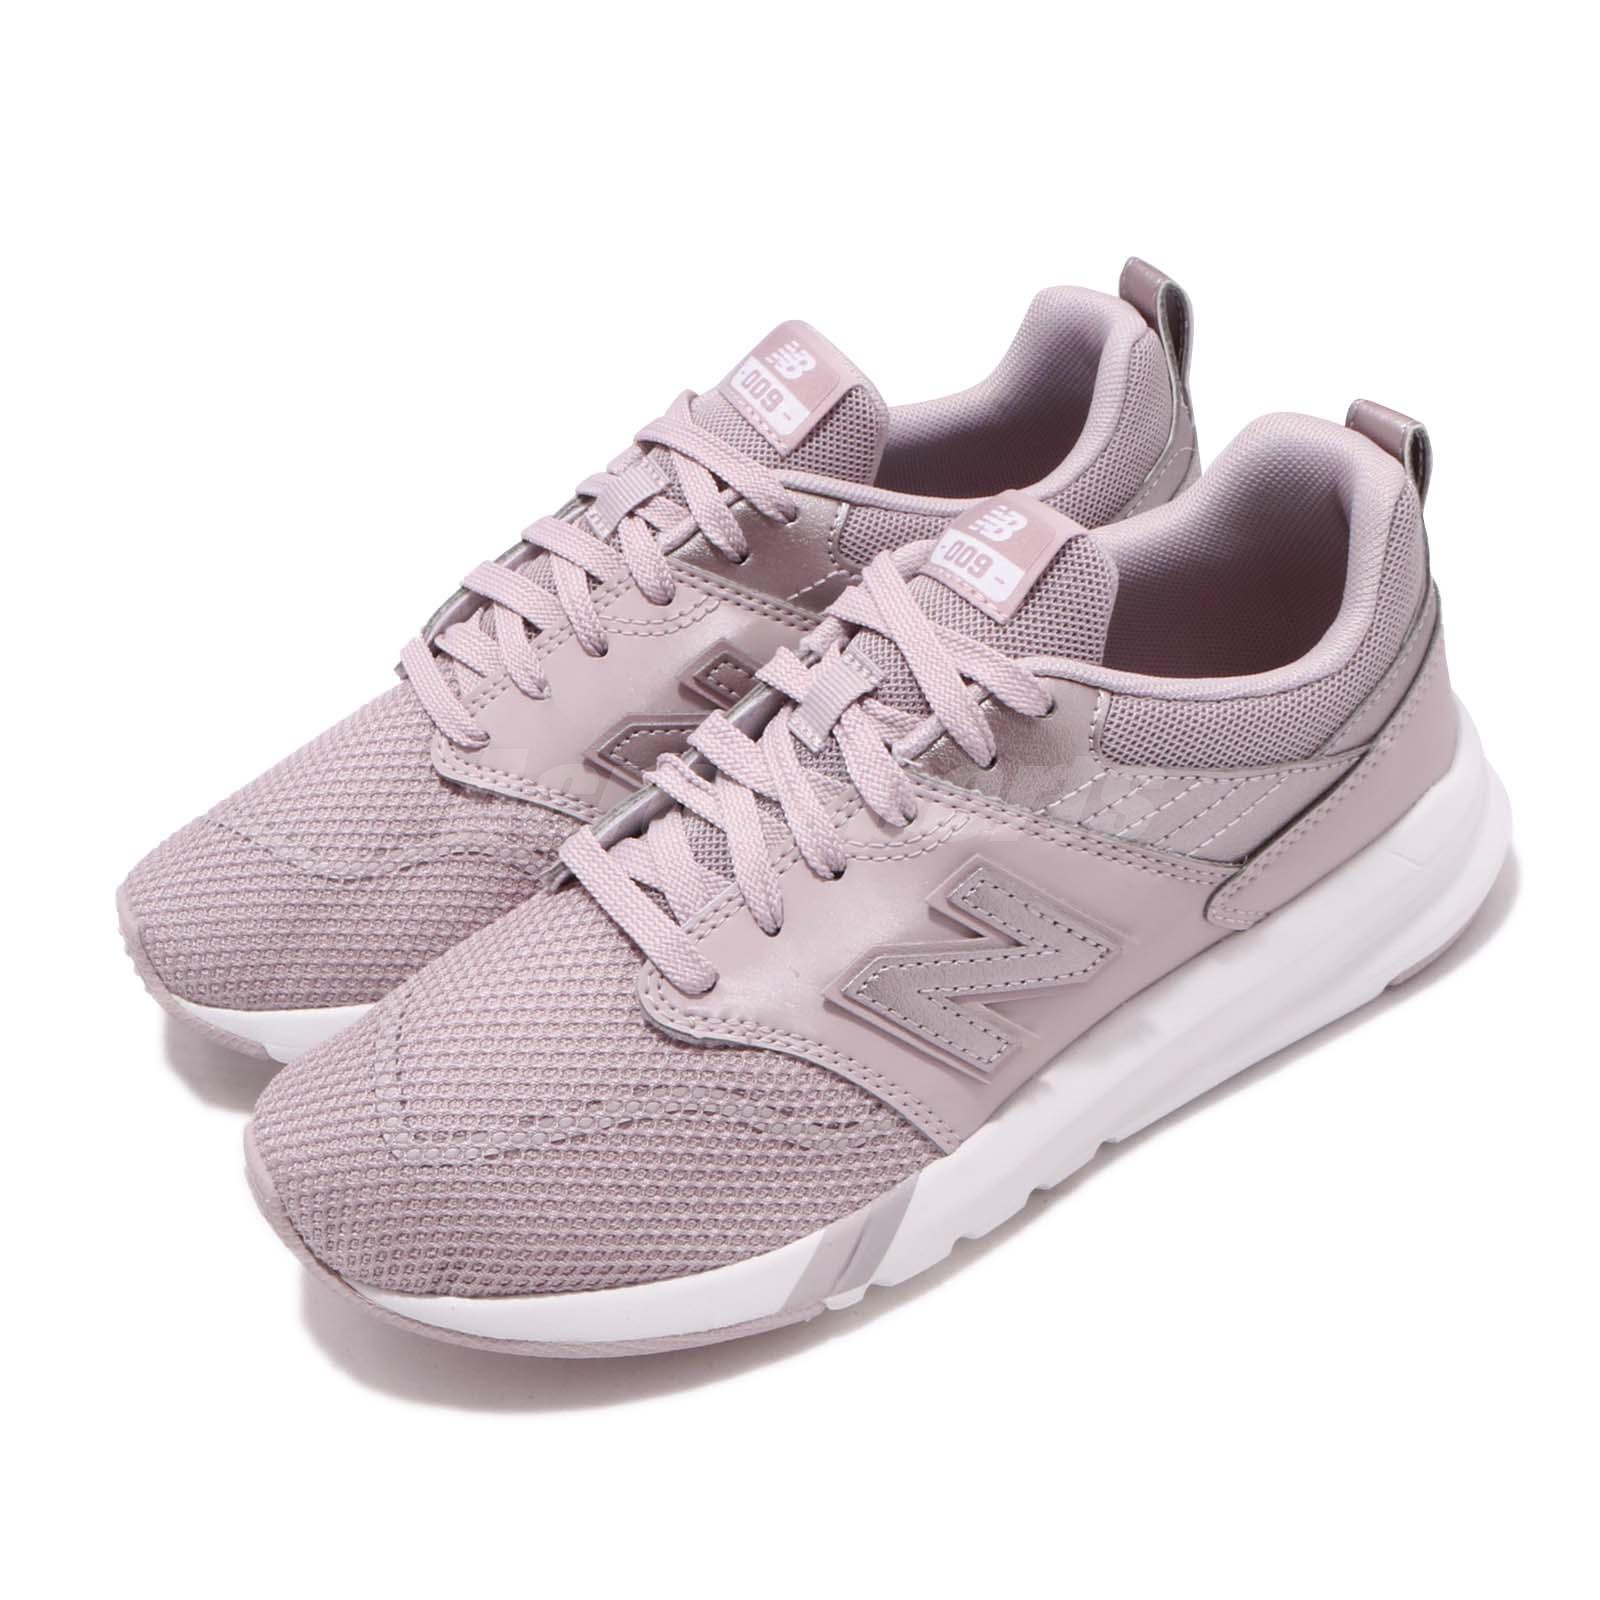 New Balance 009 Pink Grey White Women